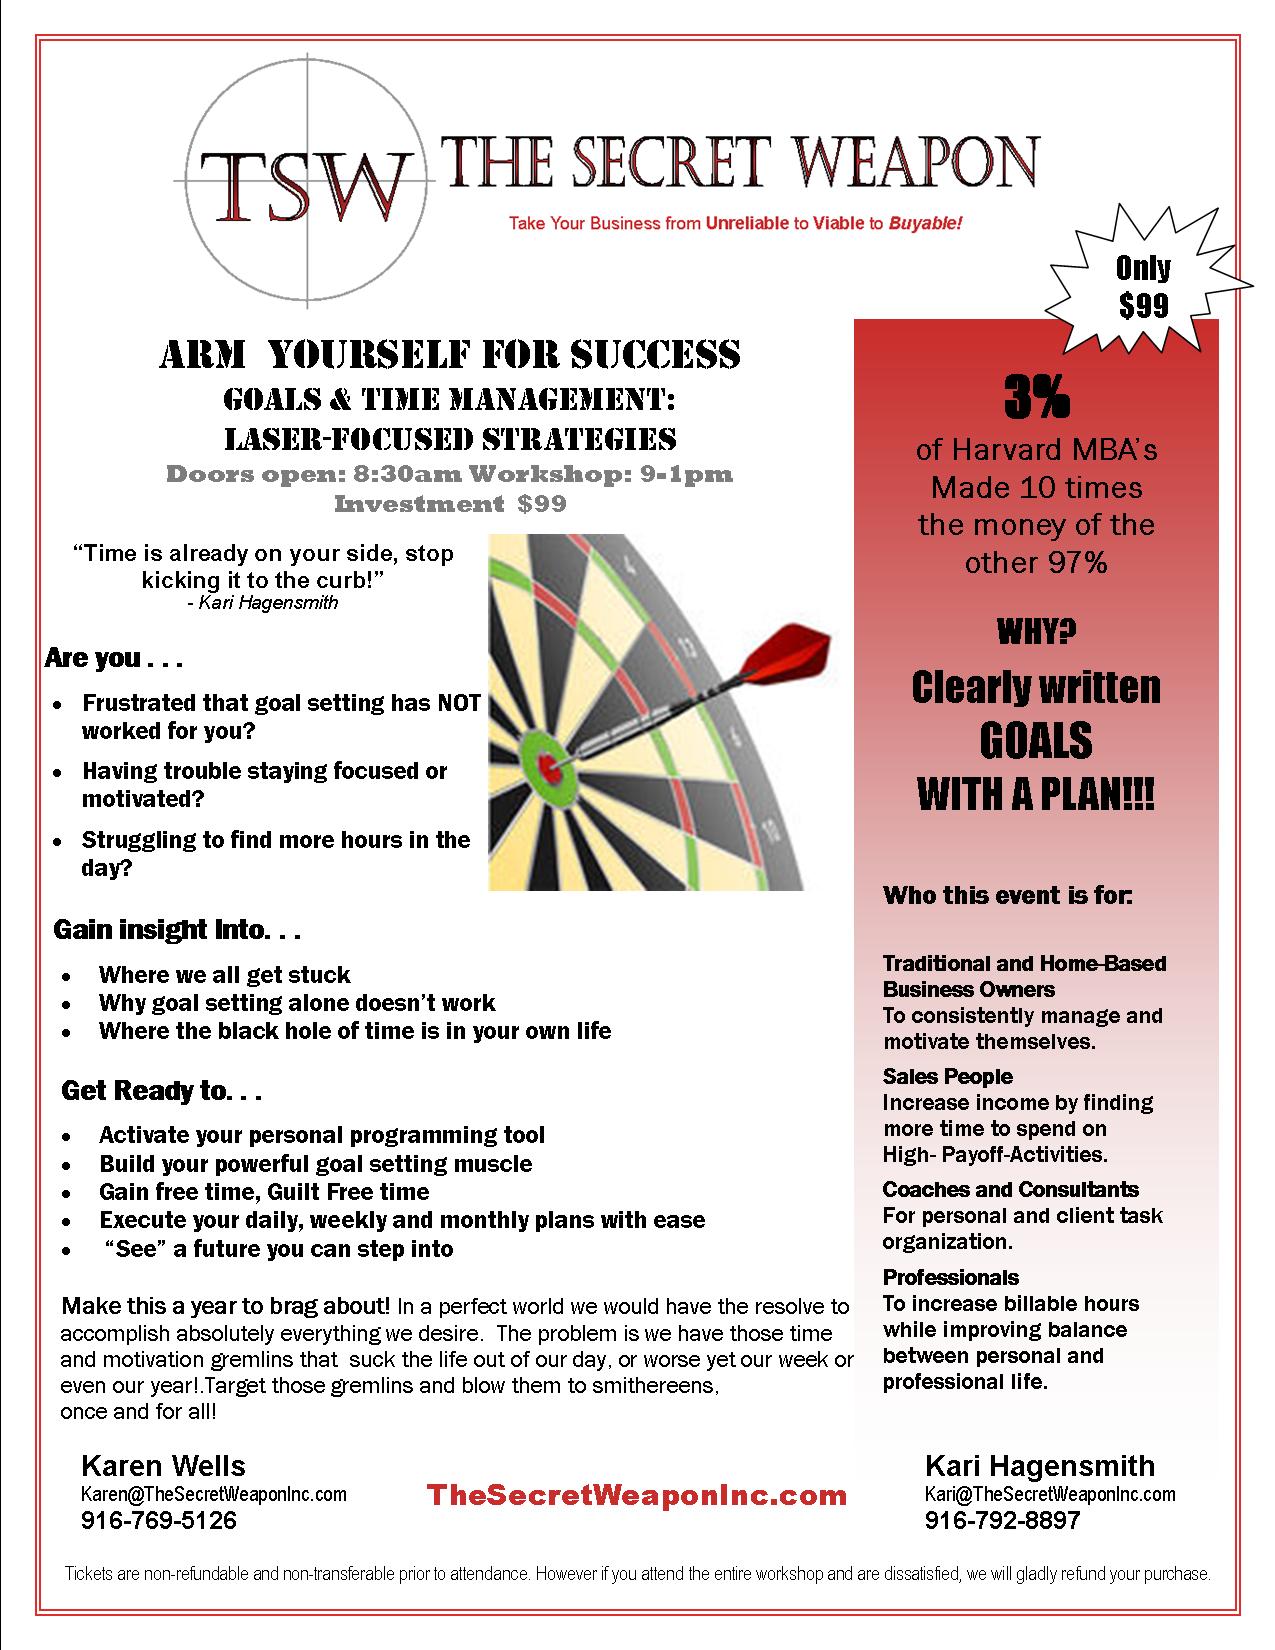 Goal Setting and Time Management, The Secret Weapon, Kari Hagensmith, Karen Wells